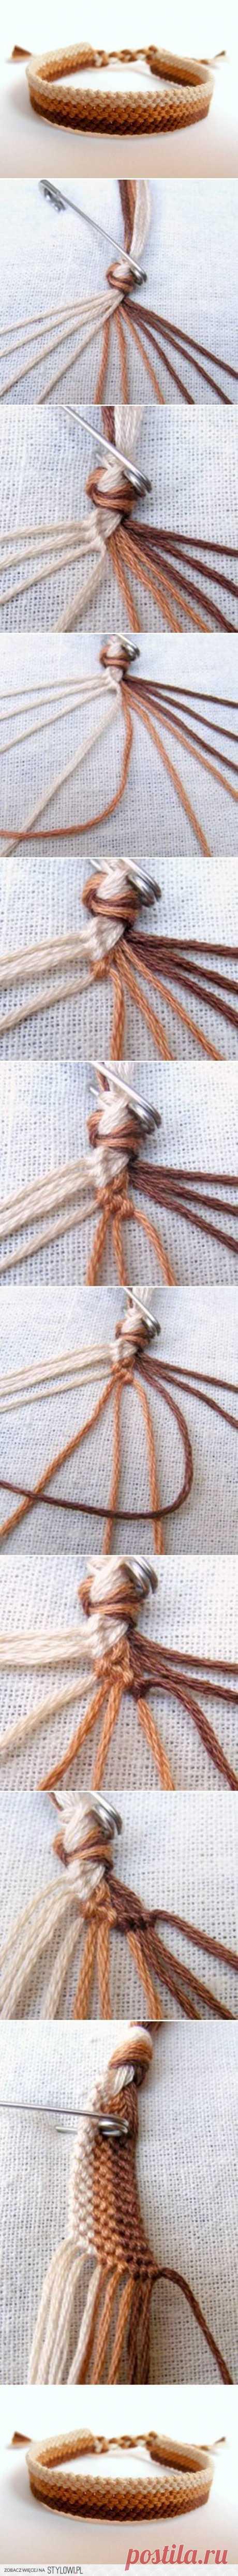 DIY Easy Weave Bracelet DIY Projects | UsefulDIY.com na Stylowi.pl